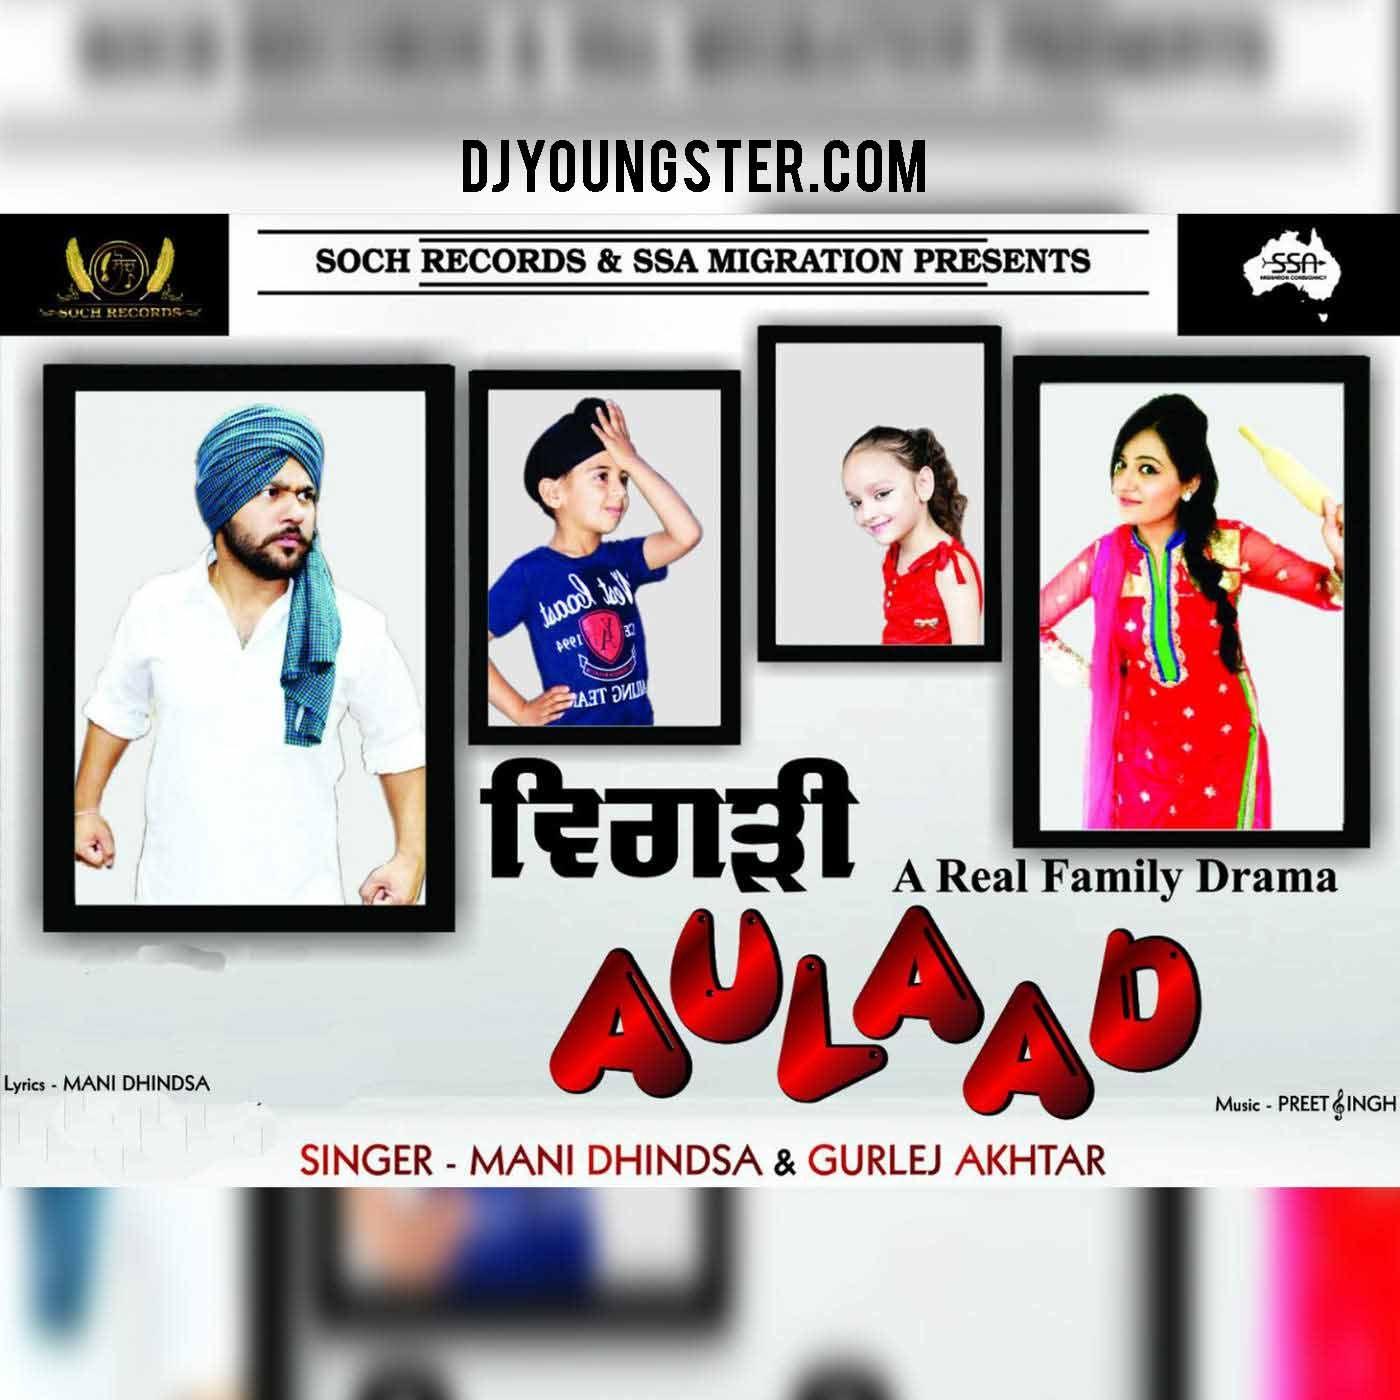 Bigdi Aulaad Gurlej AKhtar Mp3 Songs Download, download mp3 Songs